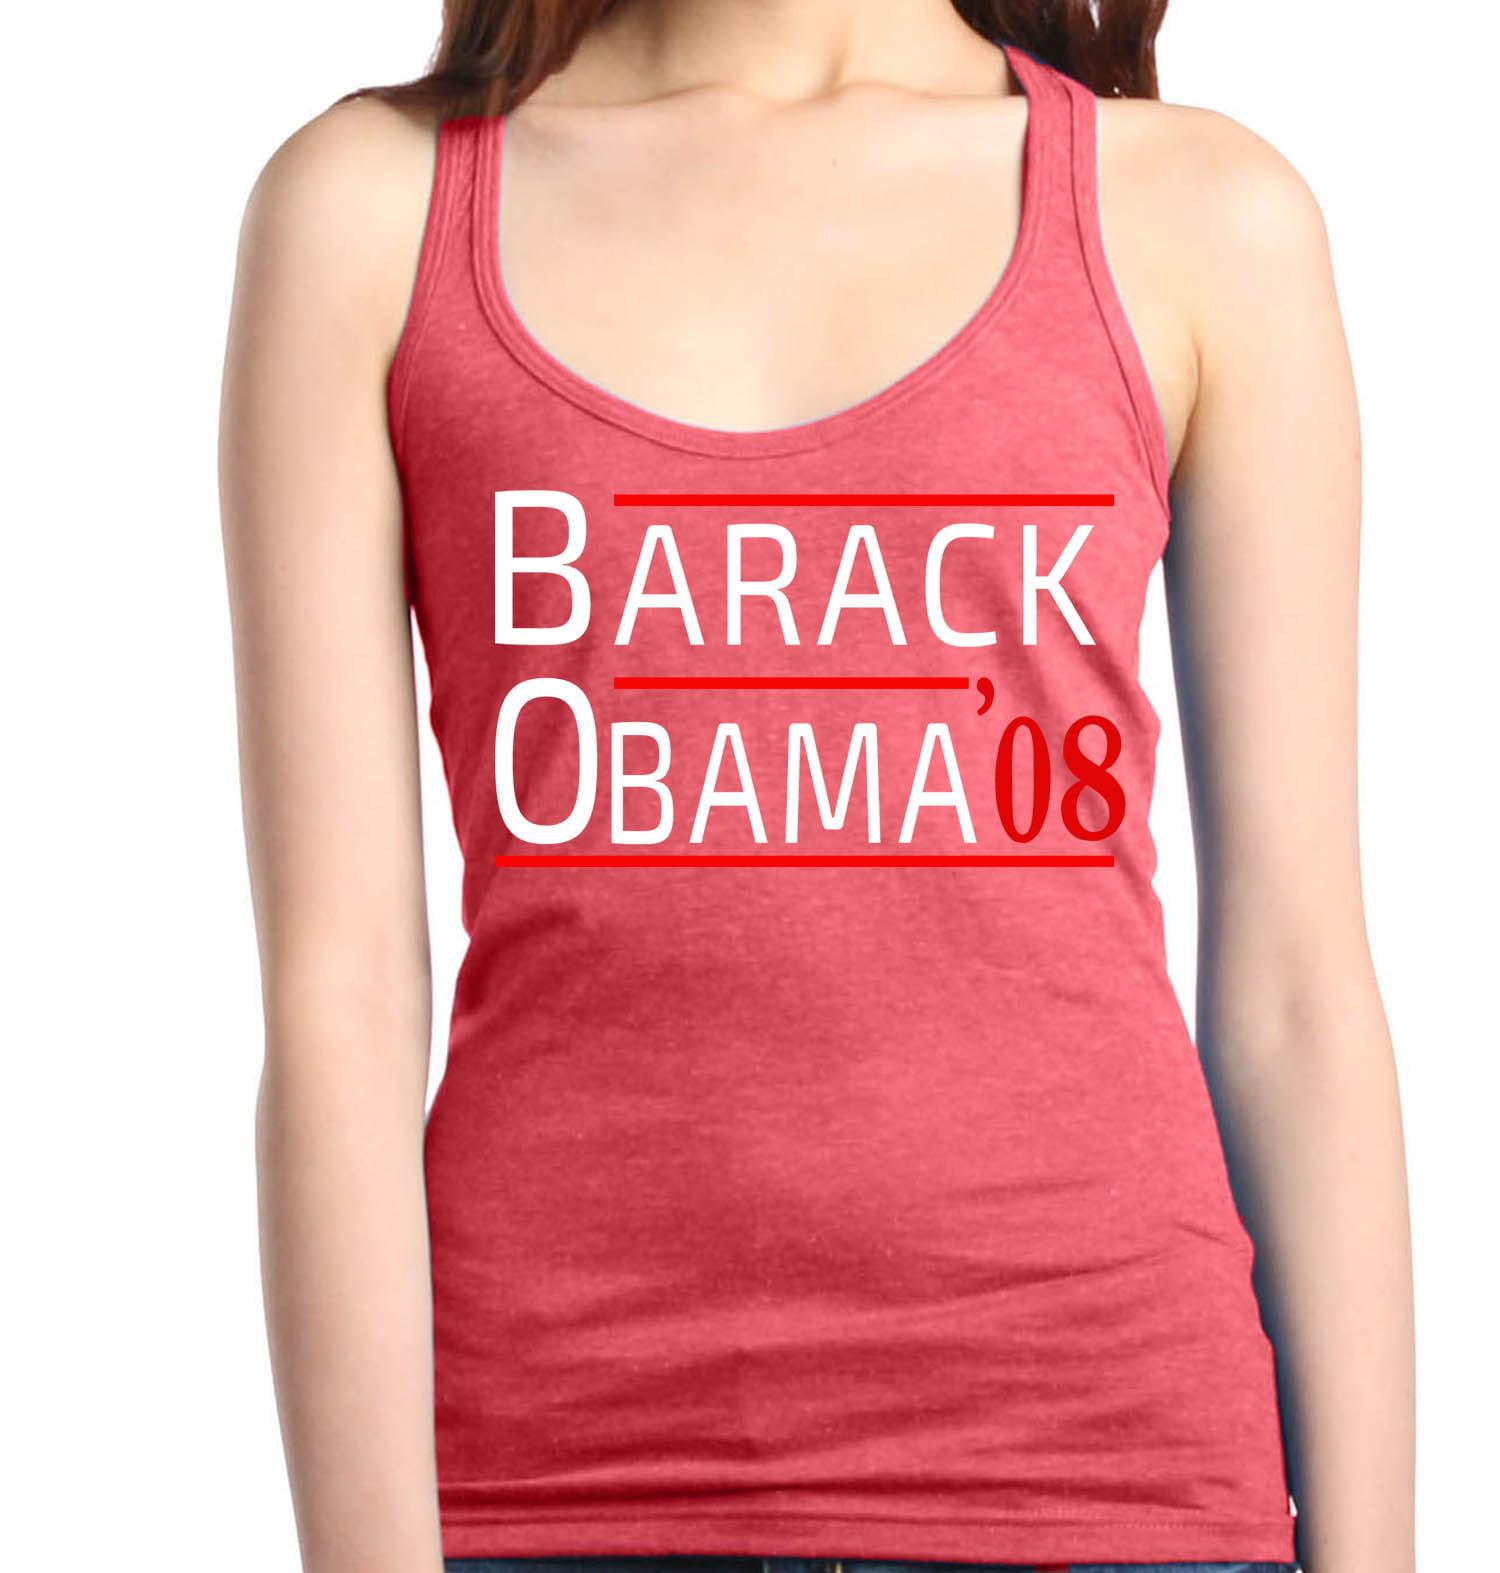 Shop4Ever Women\'s Barack Obama \'08 United States 44th President ...